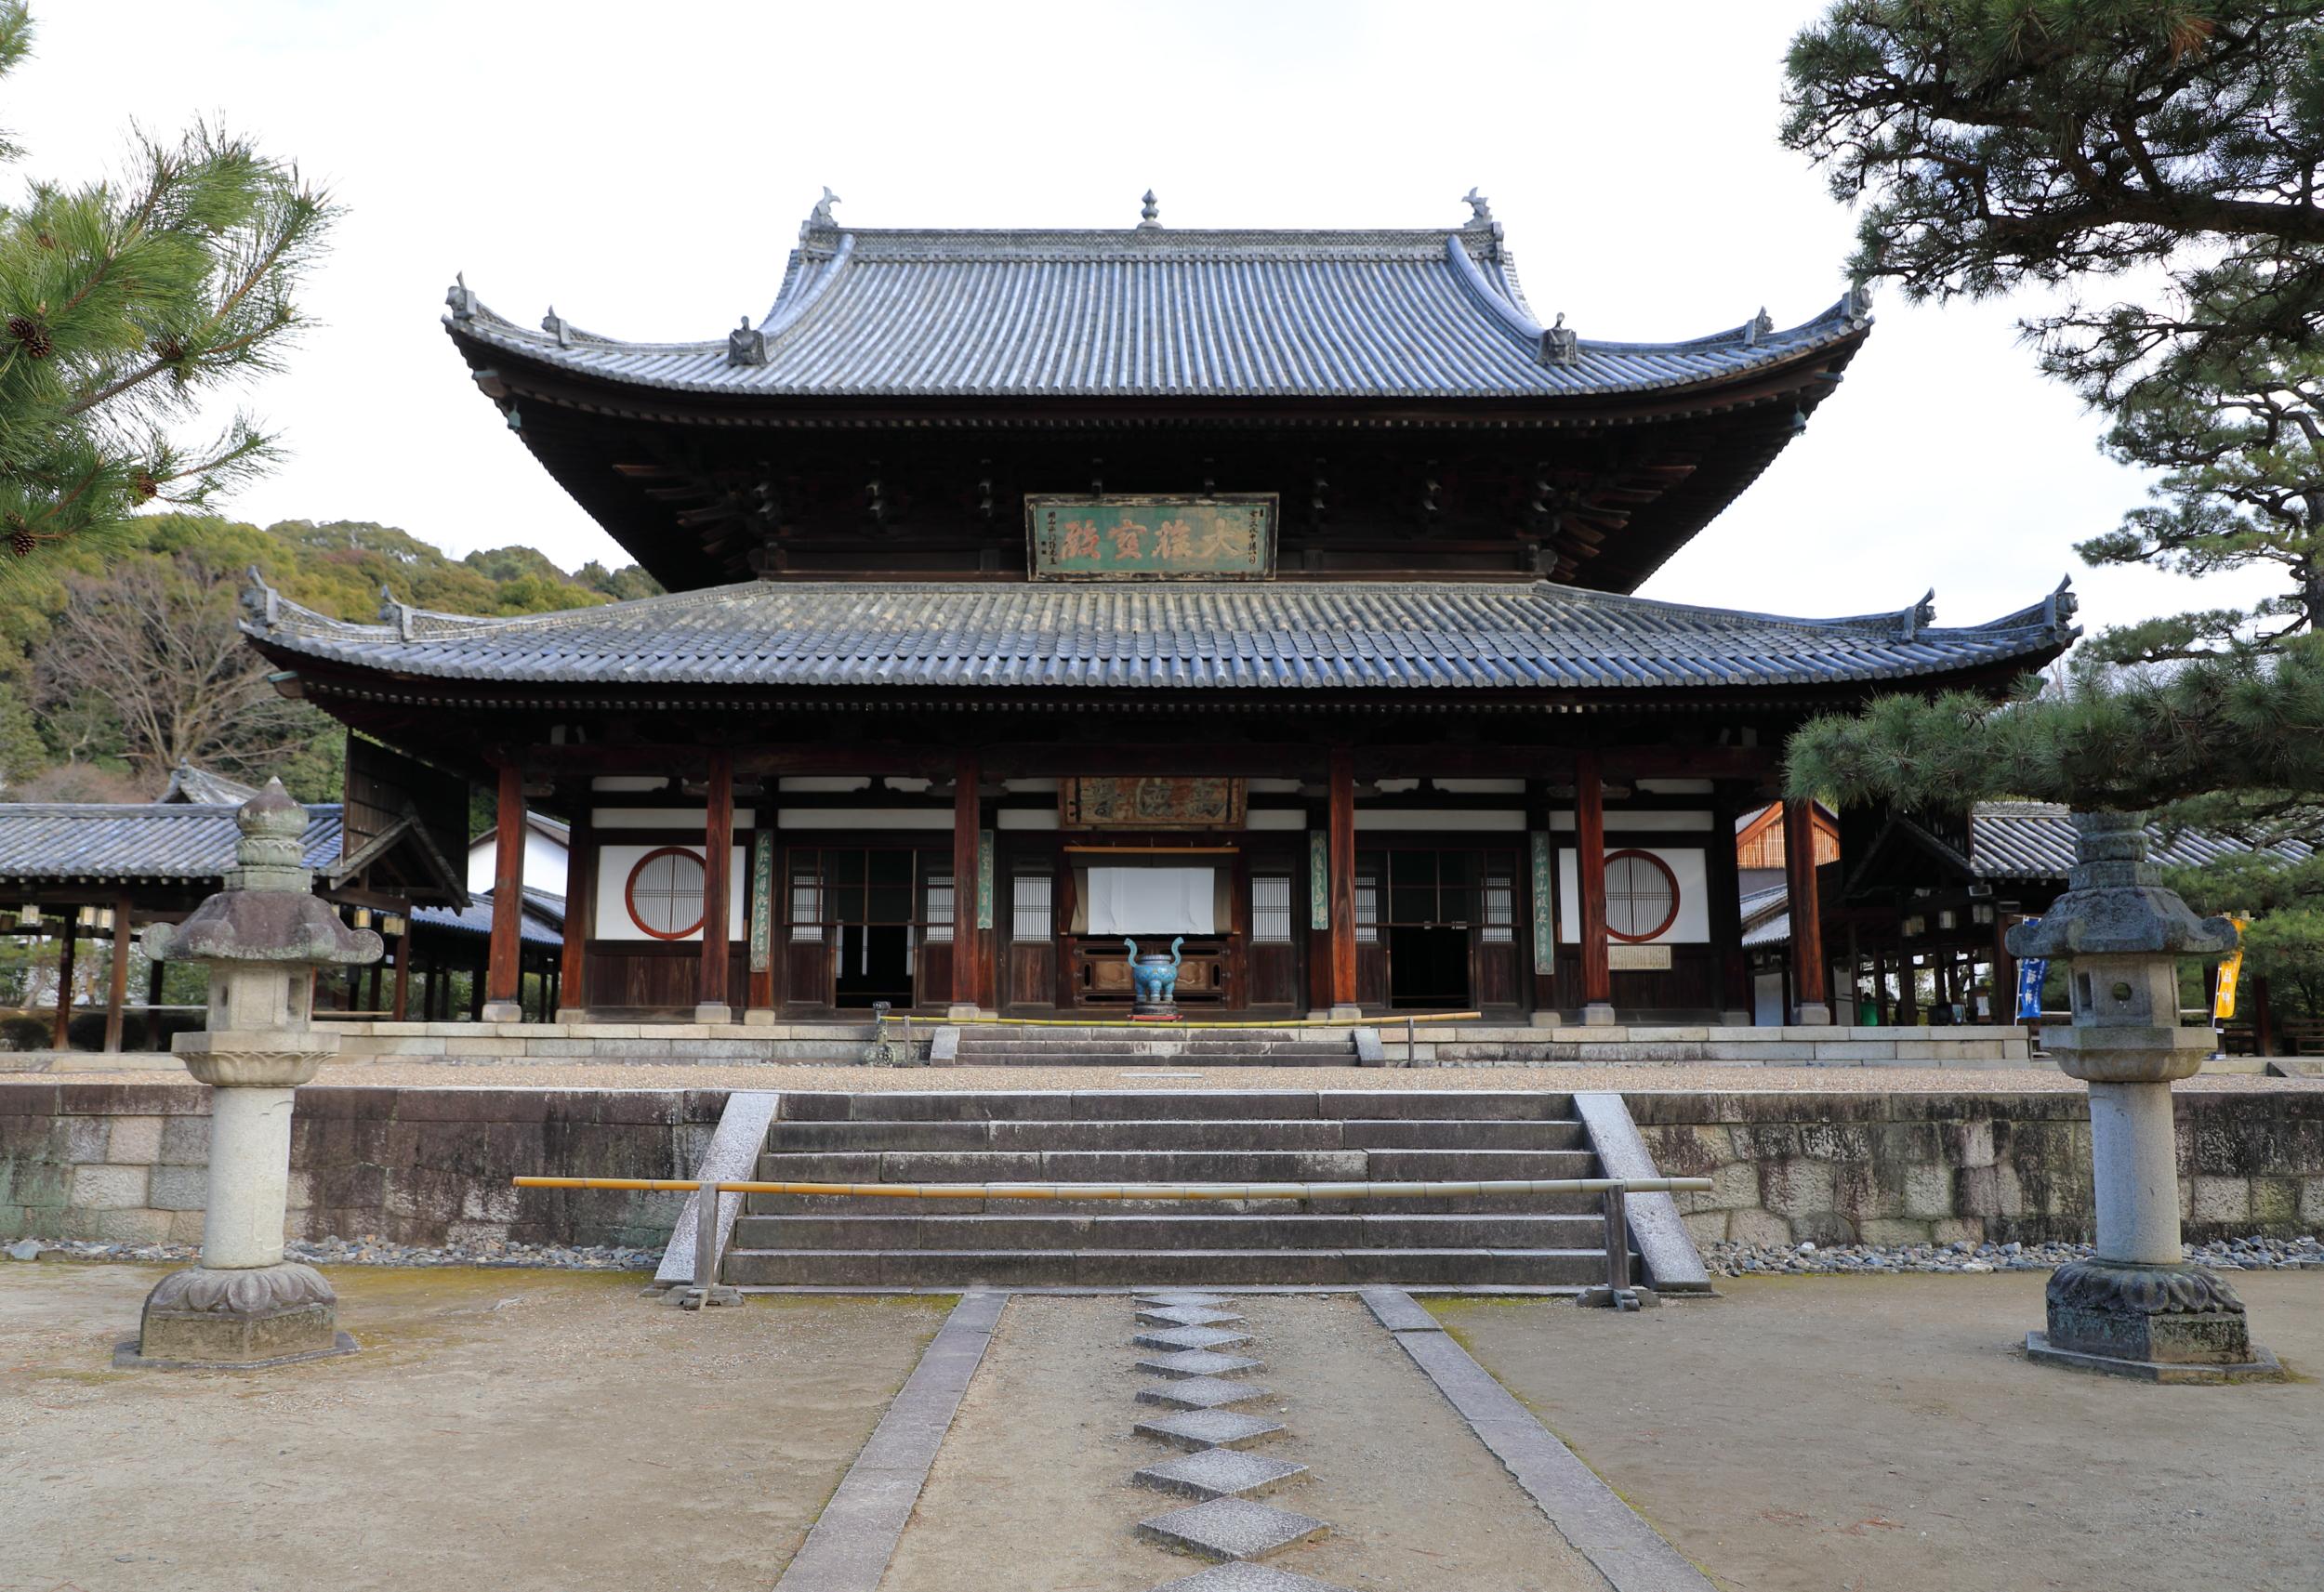 The Daio Hoden main hall of Manpuku-ji houses the temple's principle image of the Shaka Buddha and his Eighteen Rakan disciples.